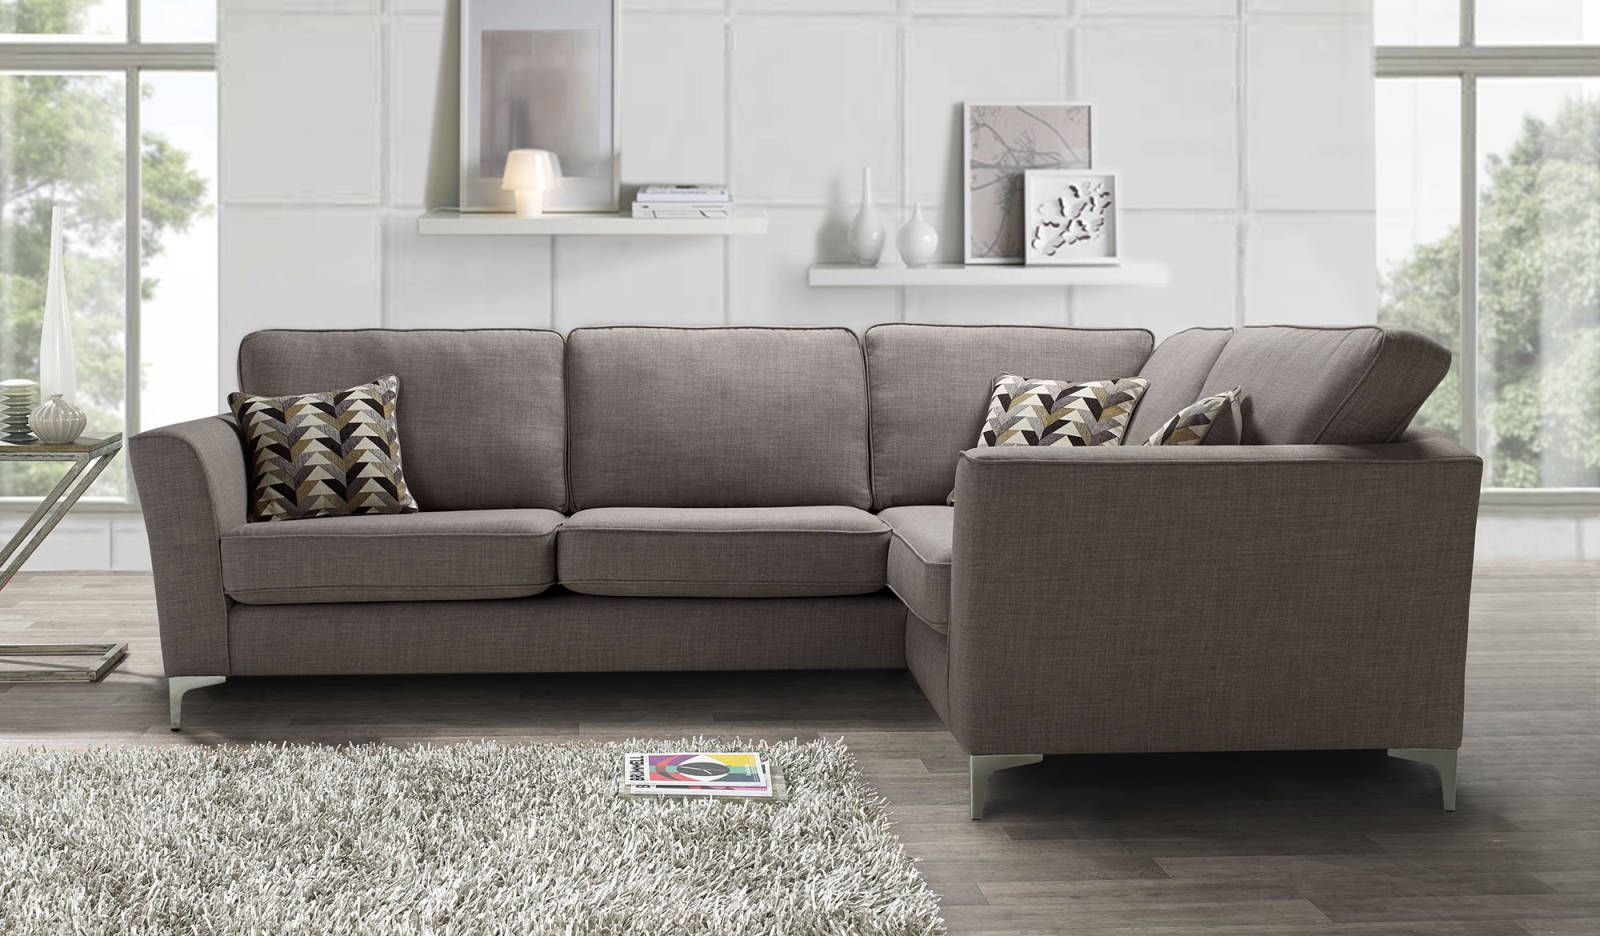 Annan Sofology Sofa Sectional Sofa Large Sofa